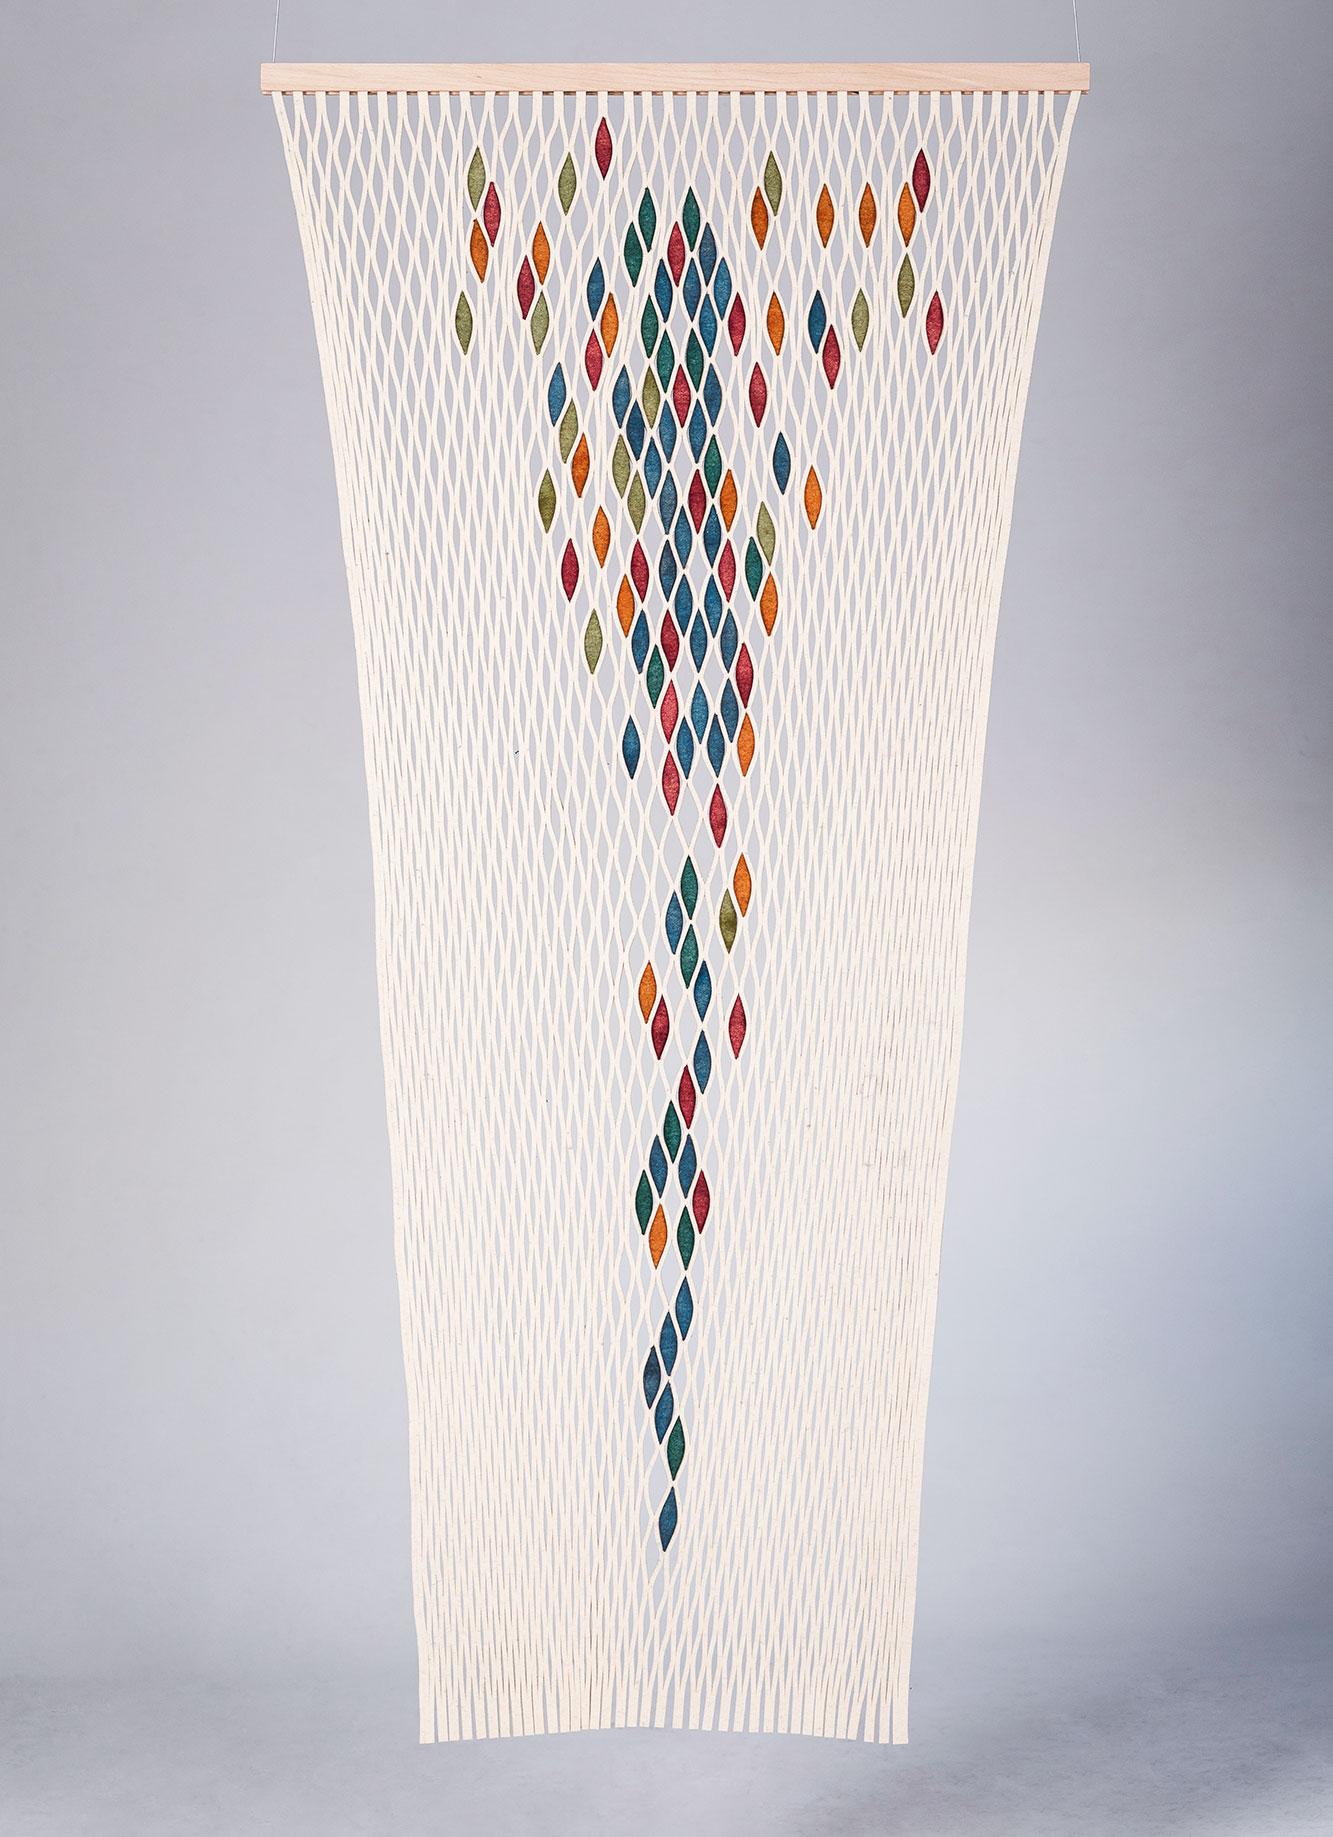 felt-textile-design-seperator